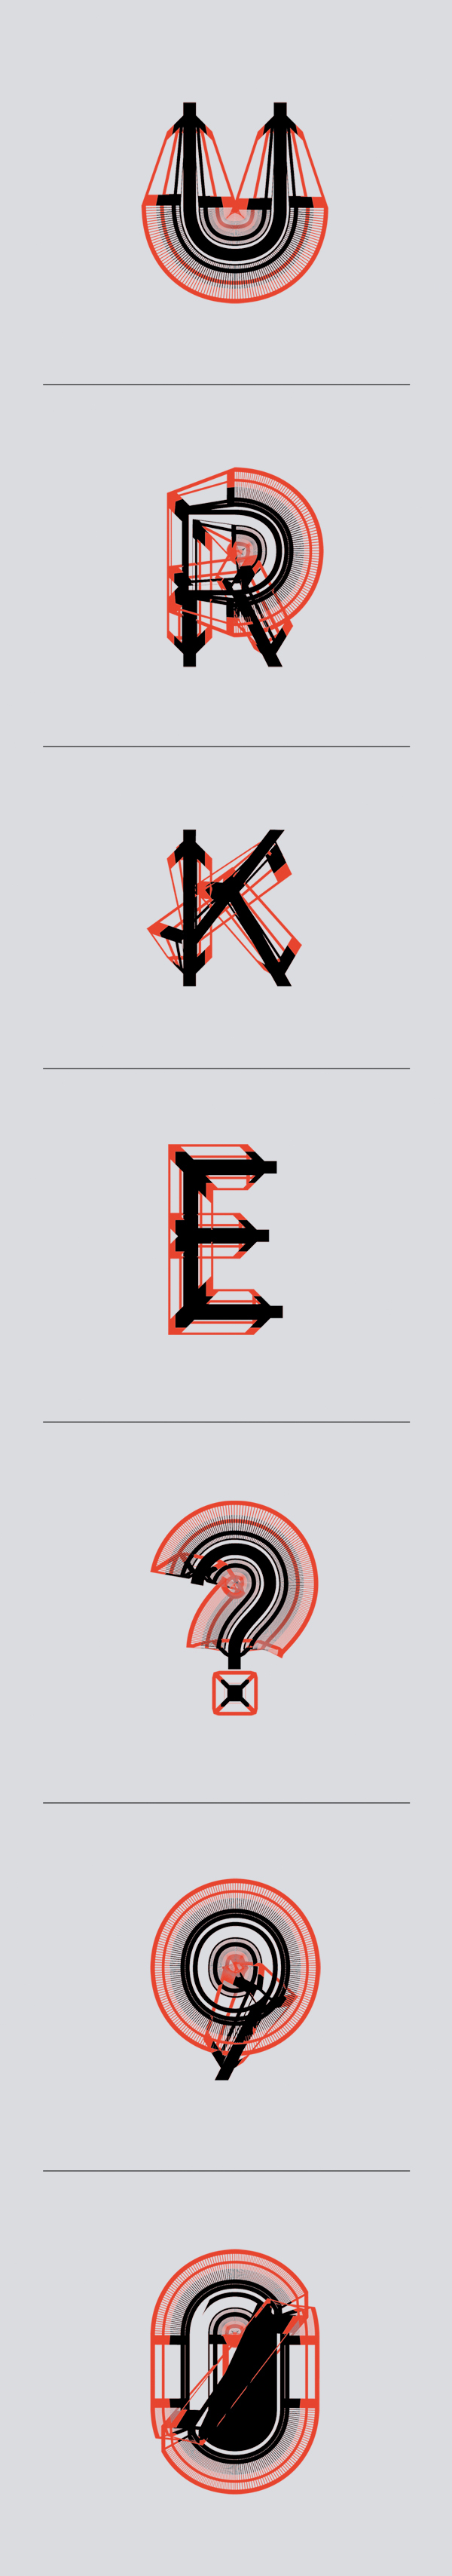 Typographie / Atelier Olschinsky